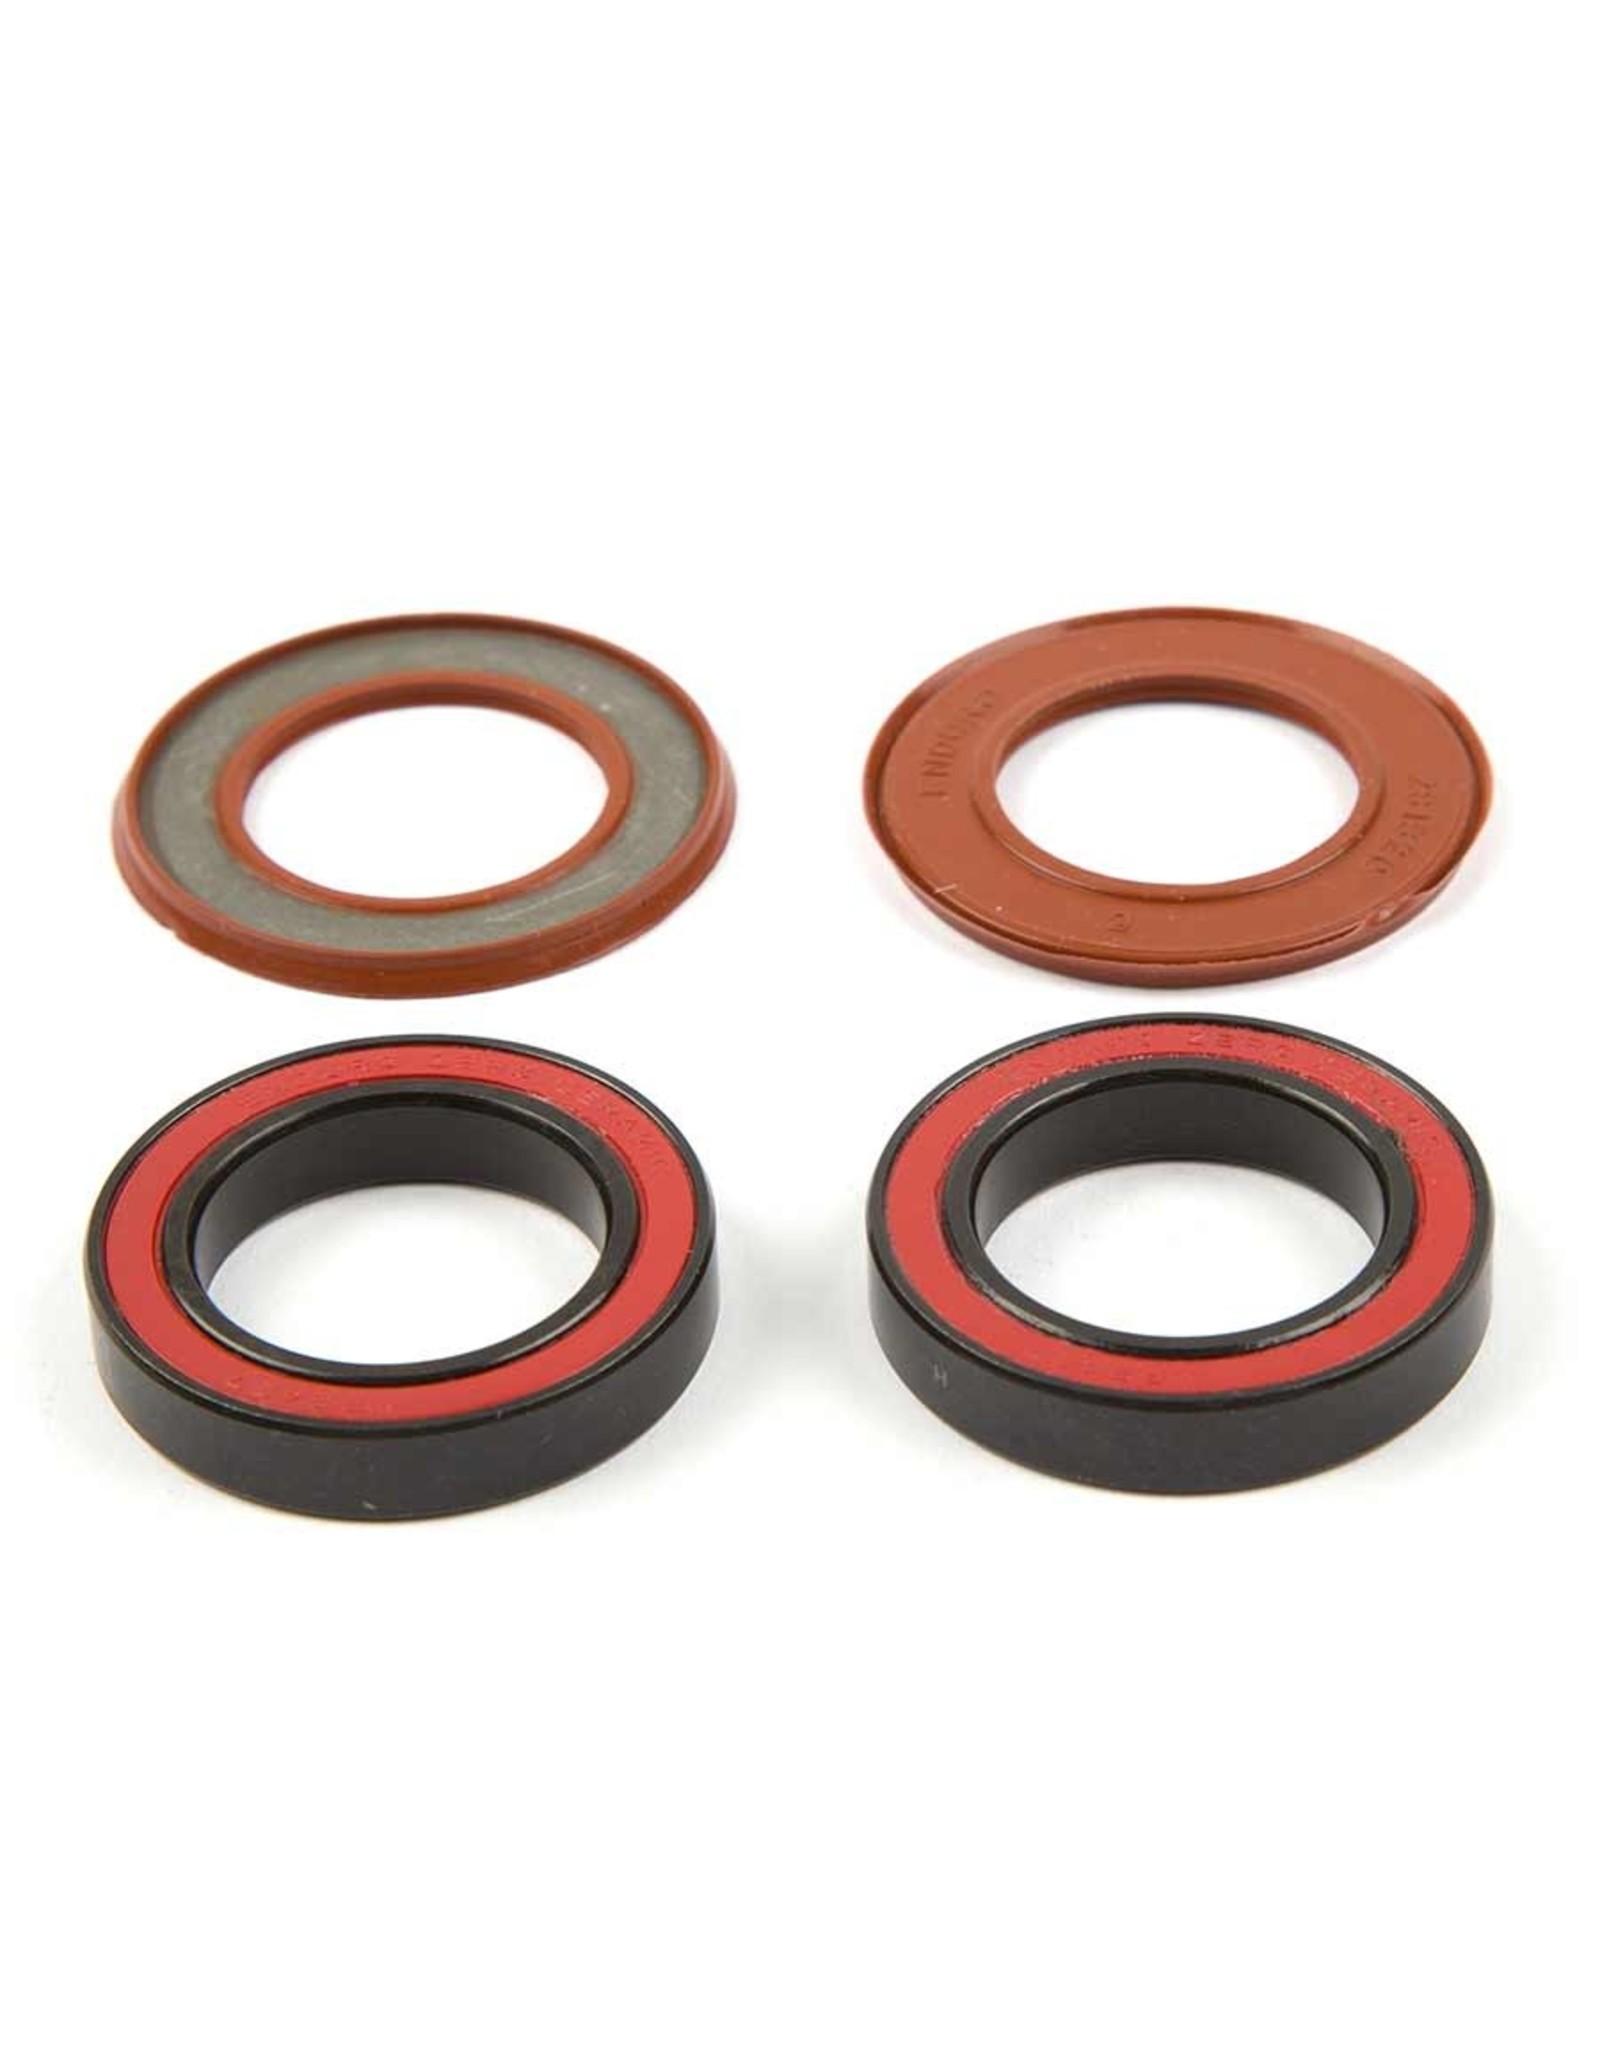 Enduro Enduro, Zero ceramic BB90, Shimano 2 Bearings, 2 Seals